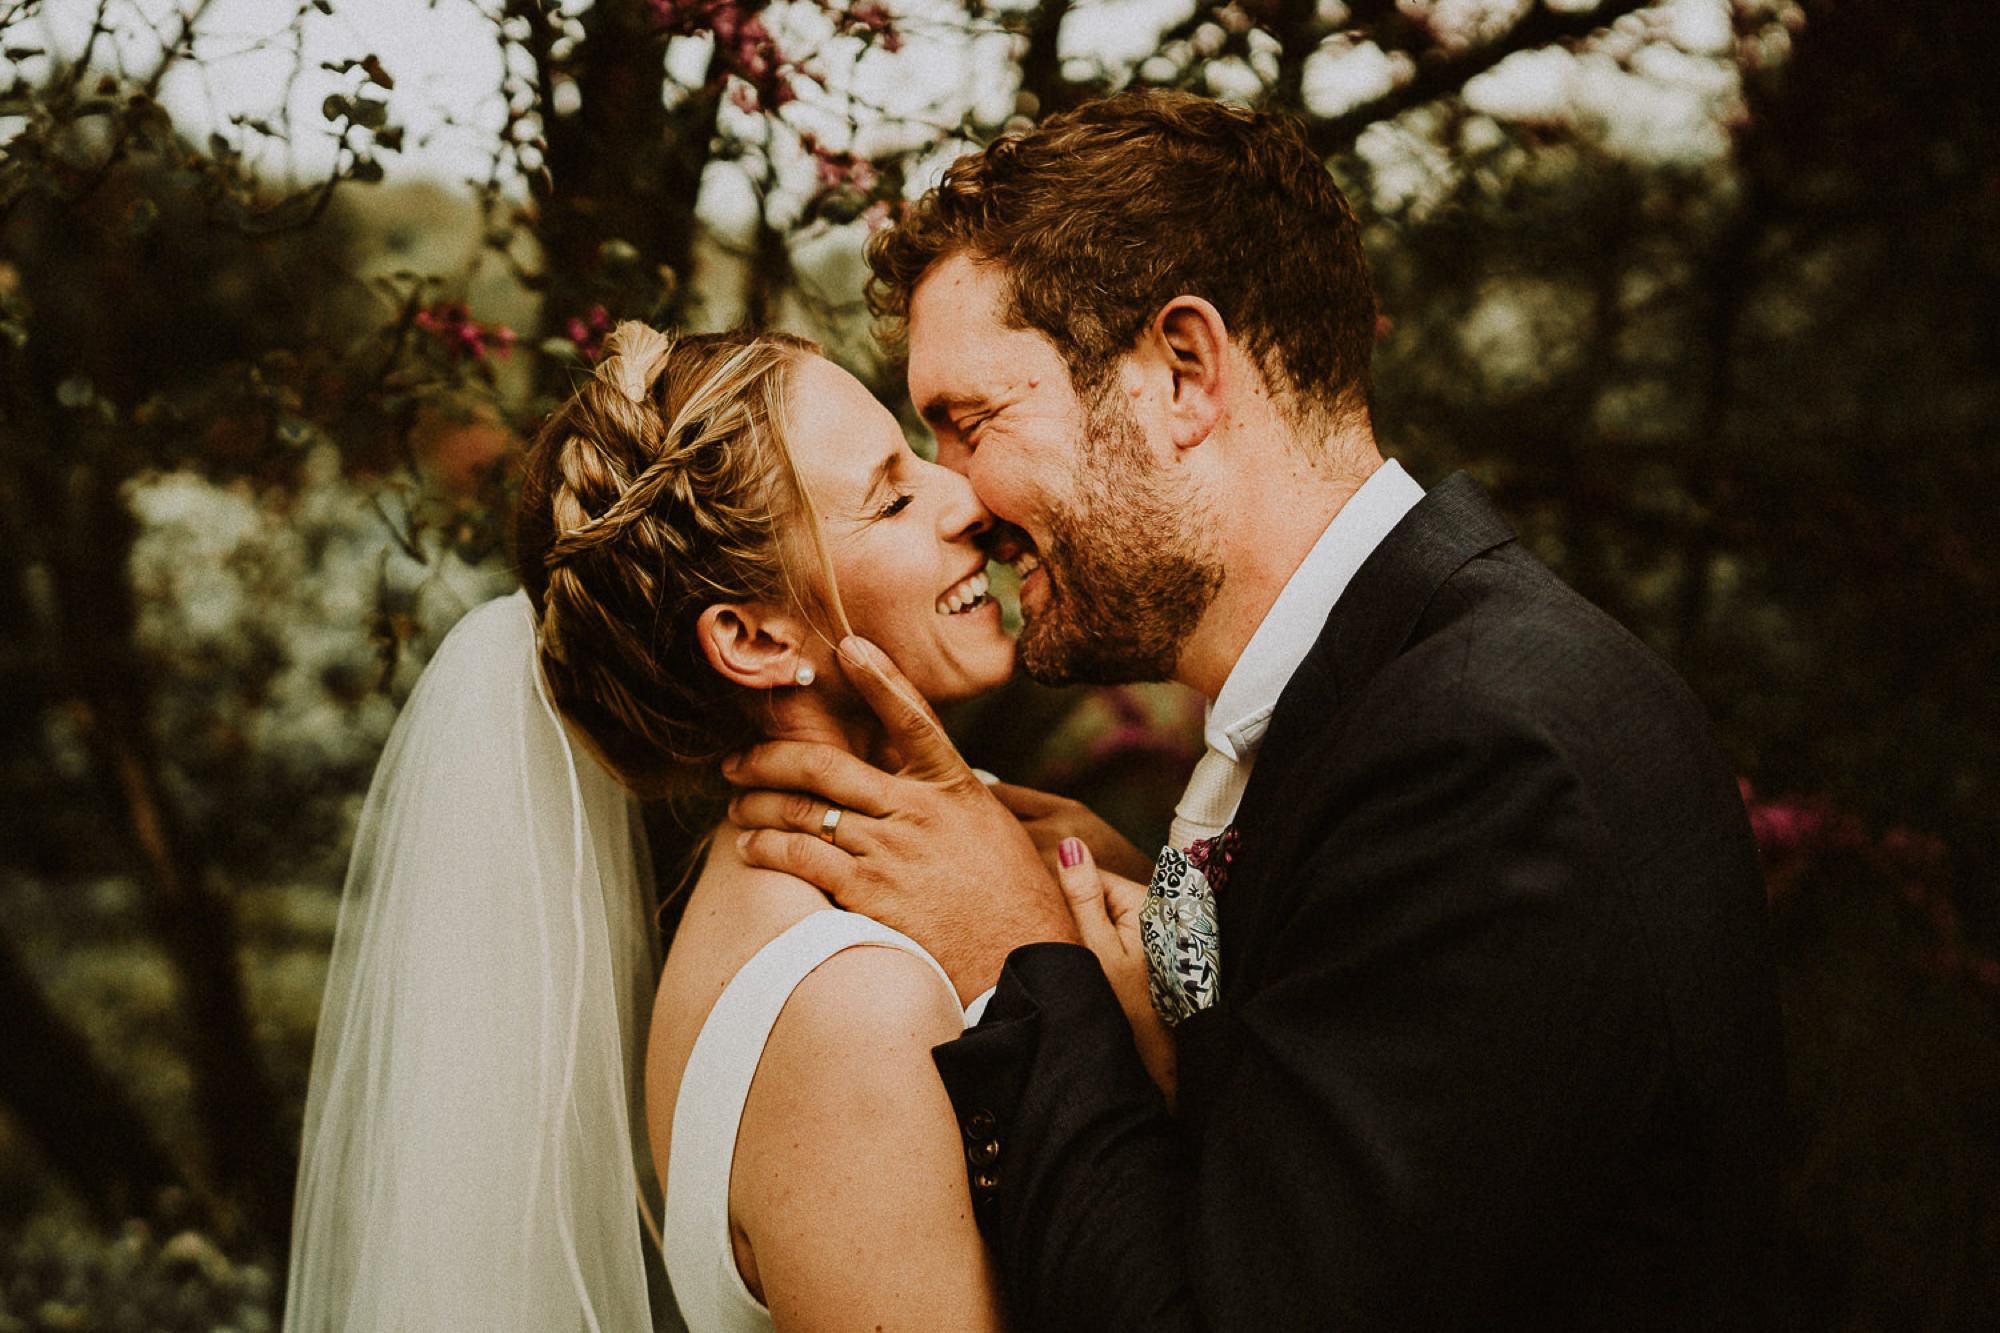 matrimonio intimo roma villa giardino botanico migliore fotografo massaro